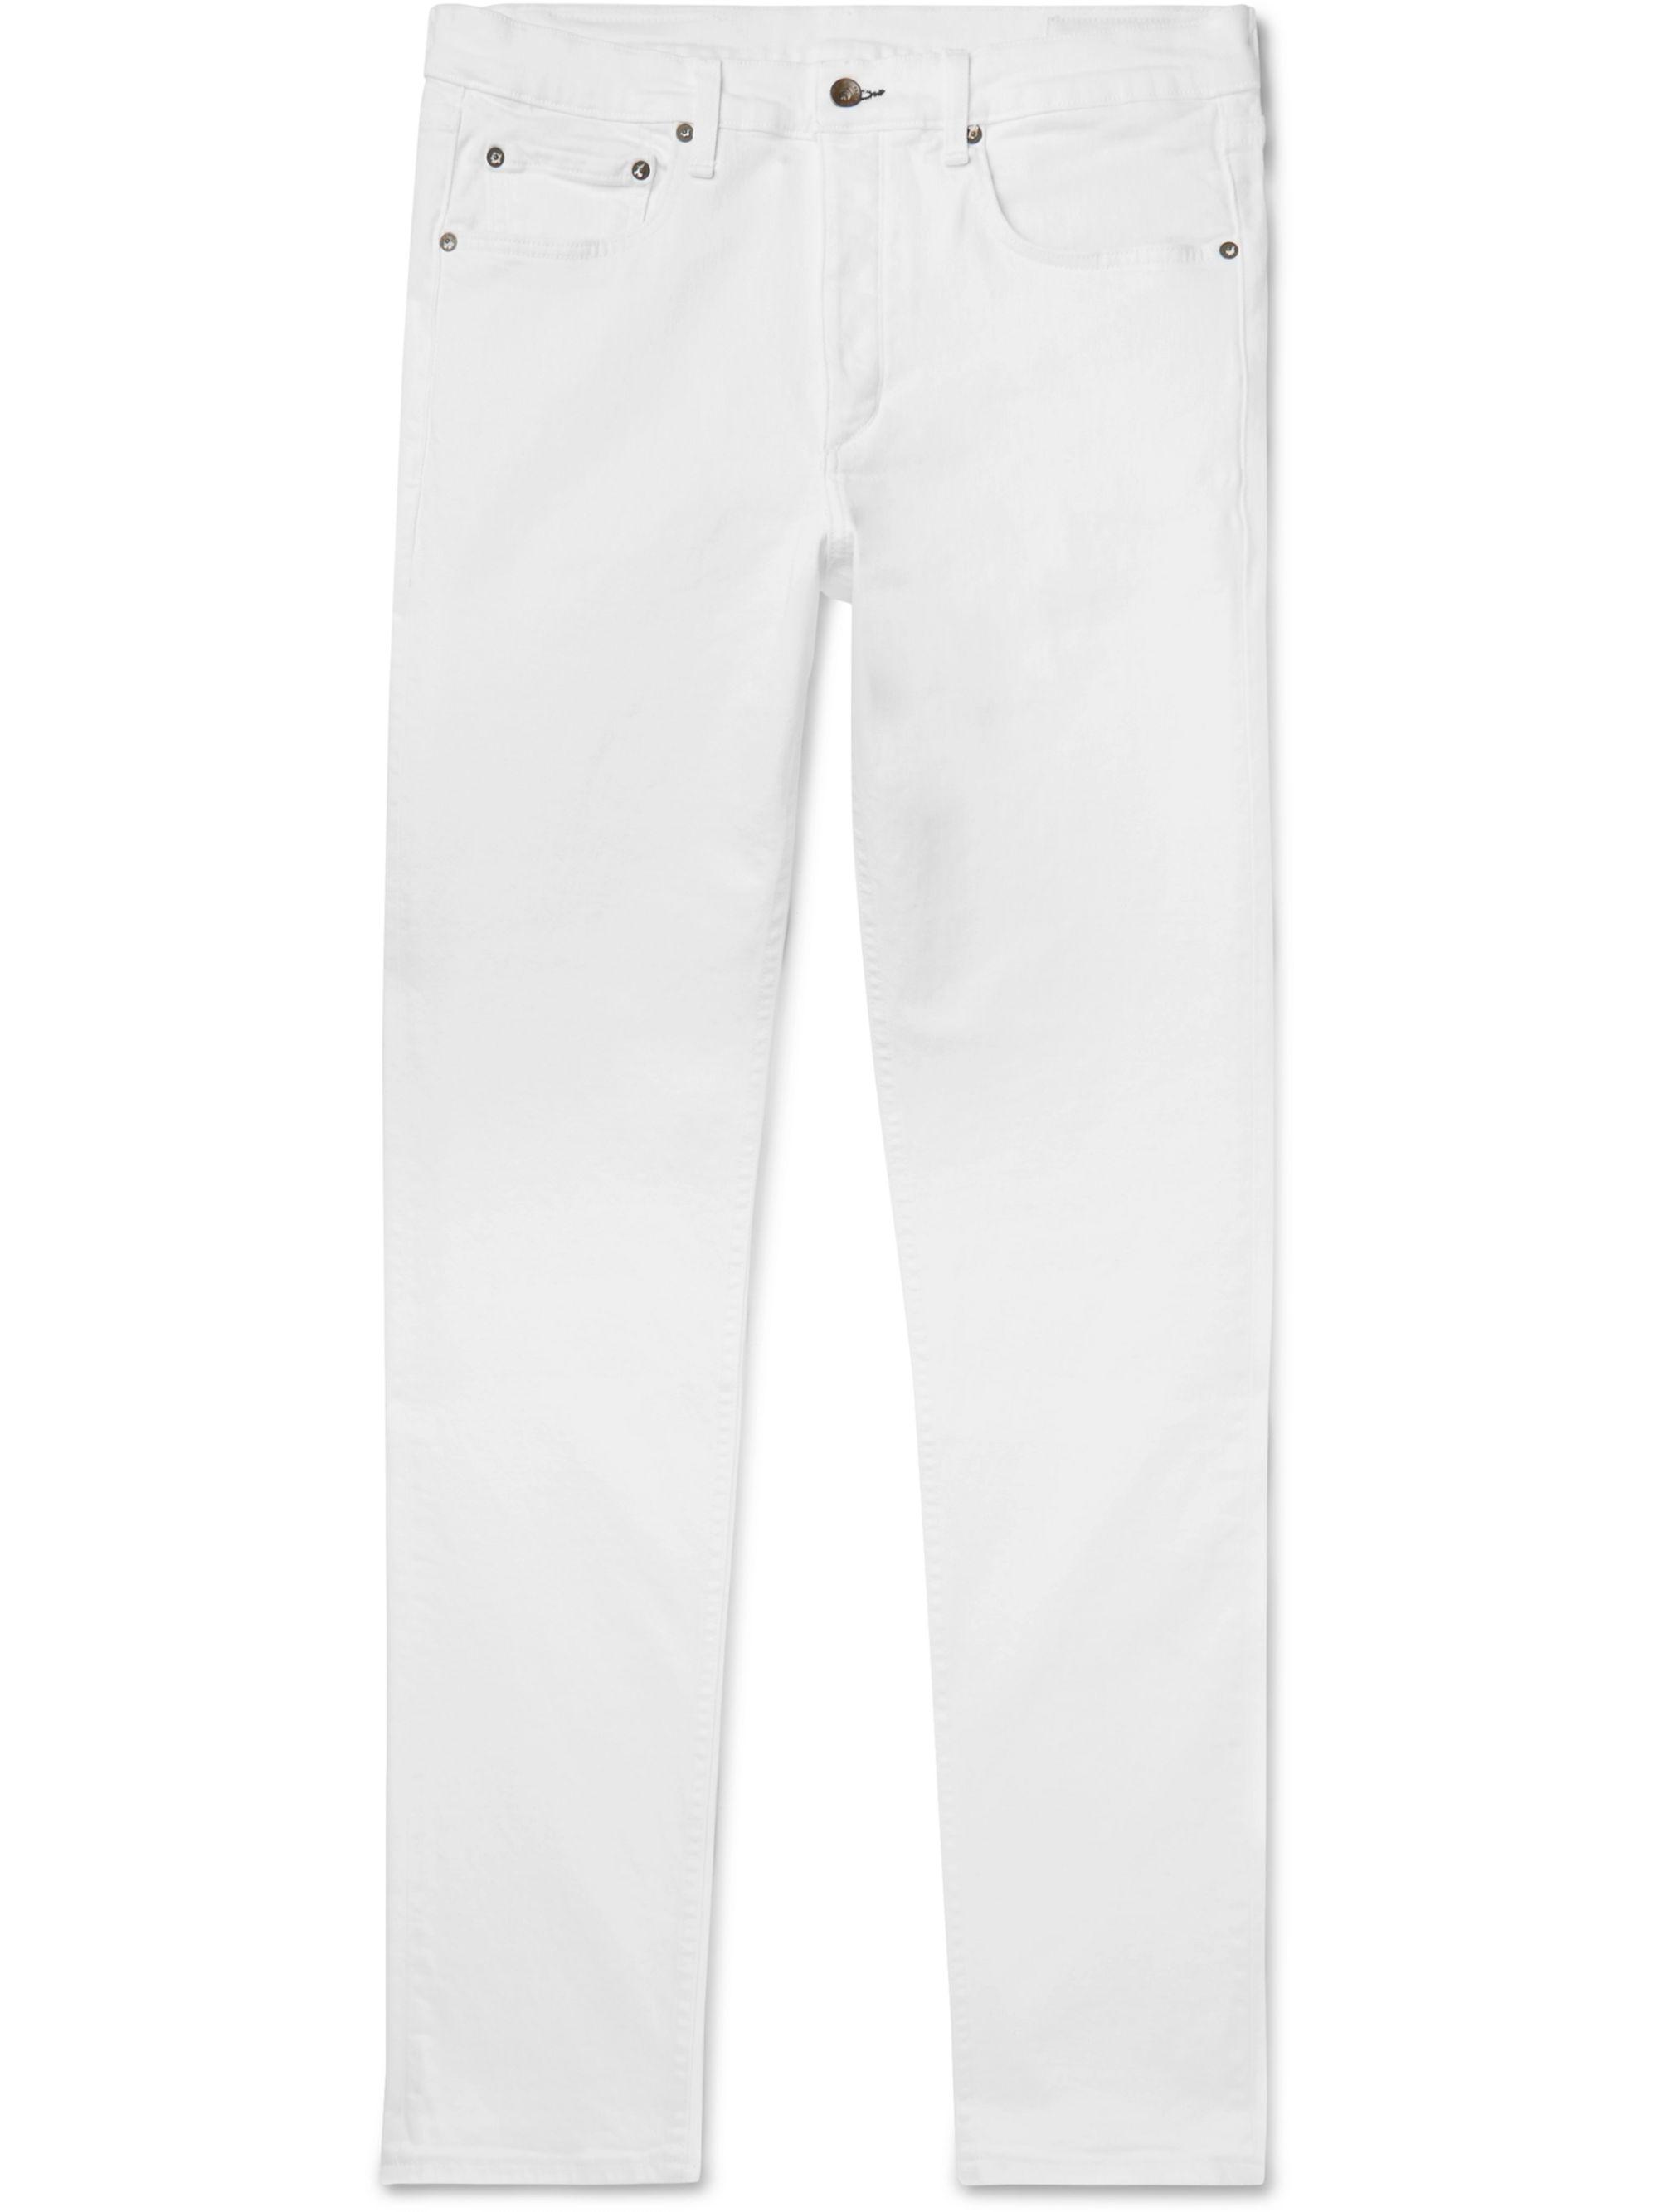 Slim Fit Denim Jeans by Rag & Bone